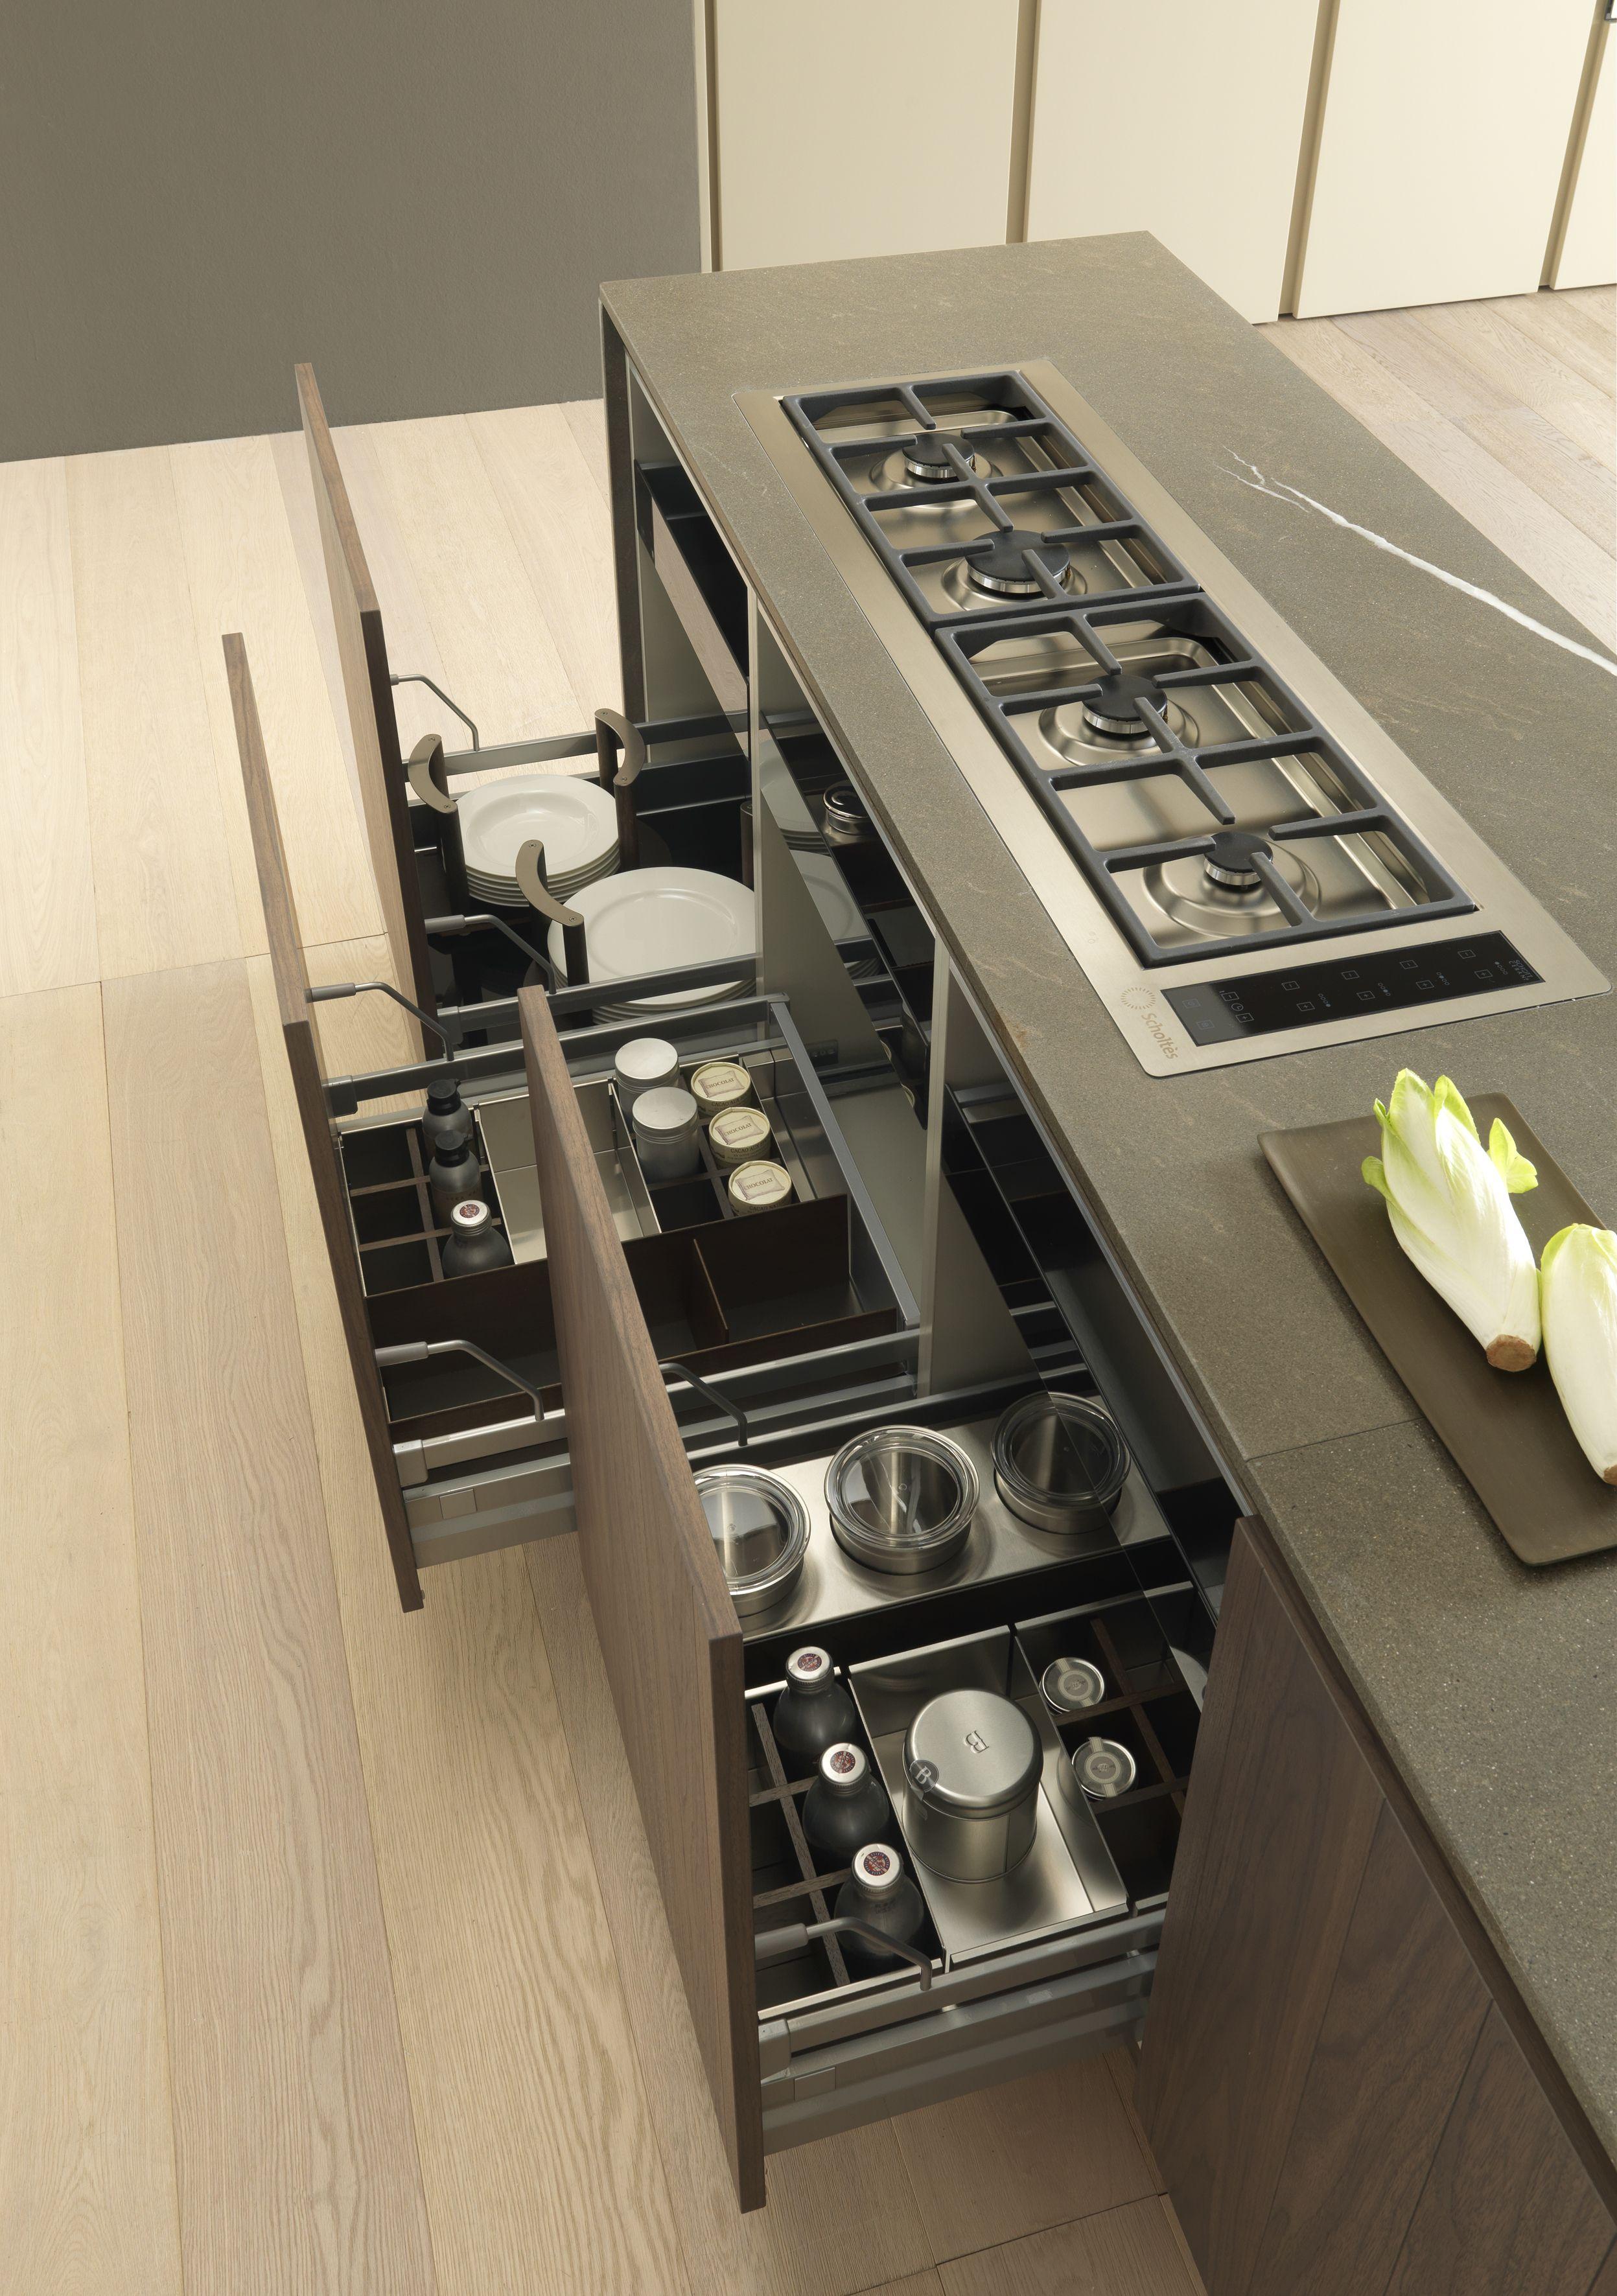 Bulthaup - B3 B3 modular drawer organization system in wood and ...